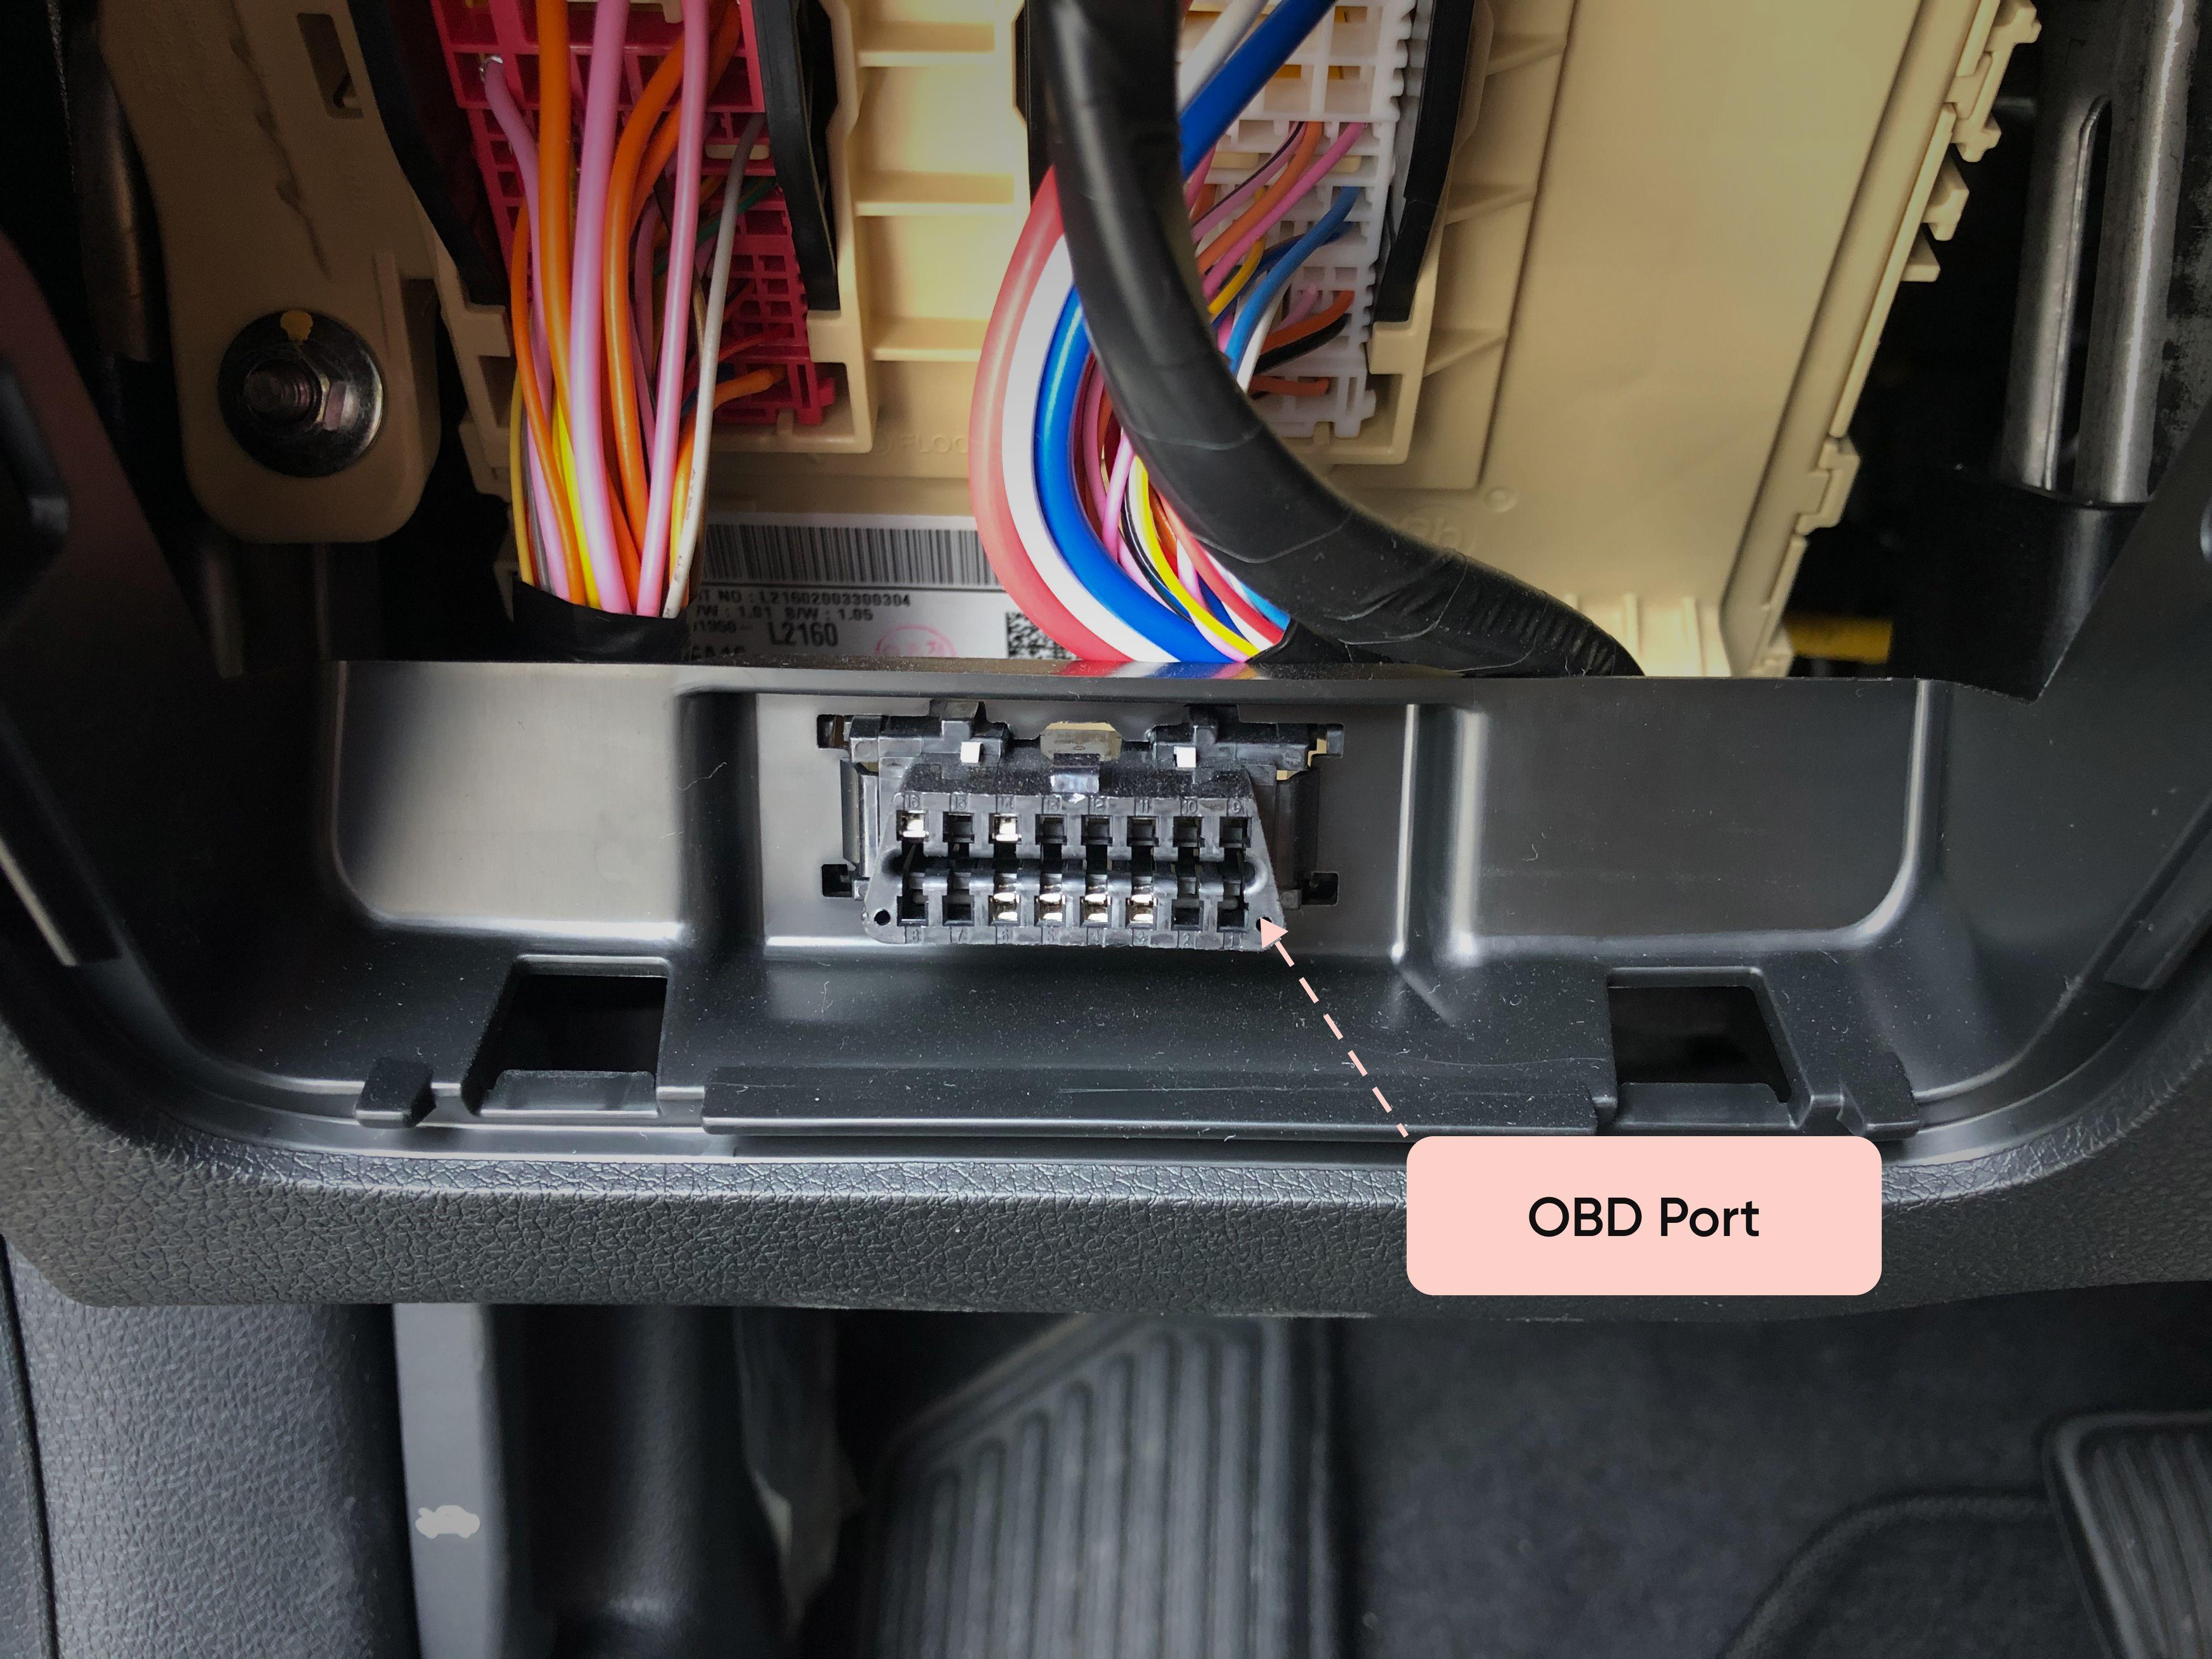 OBD port example